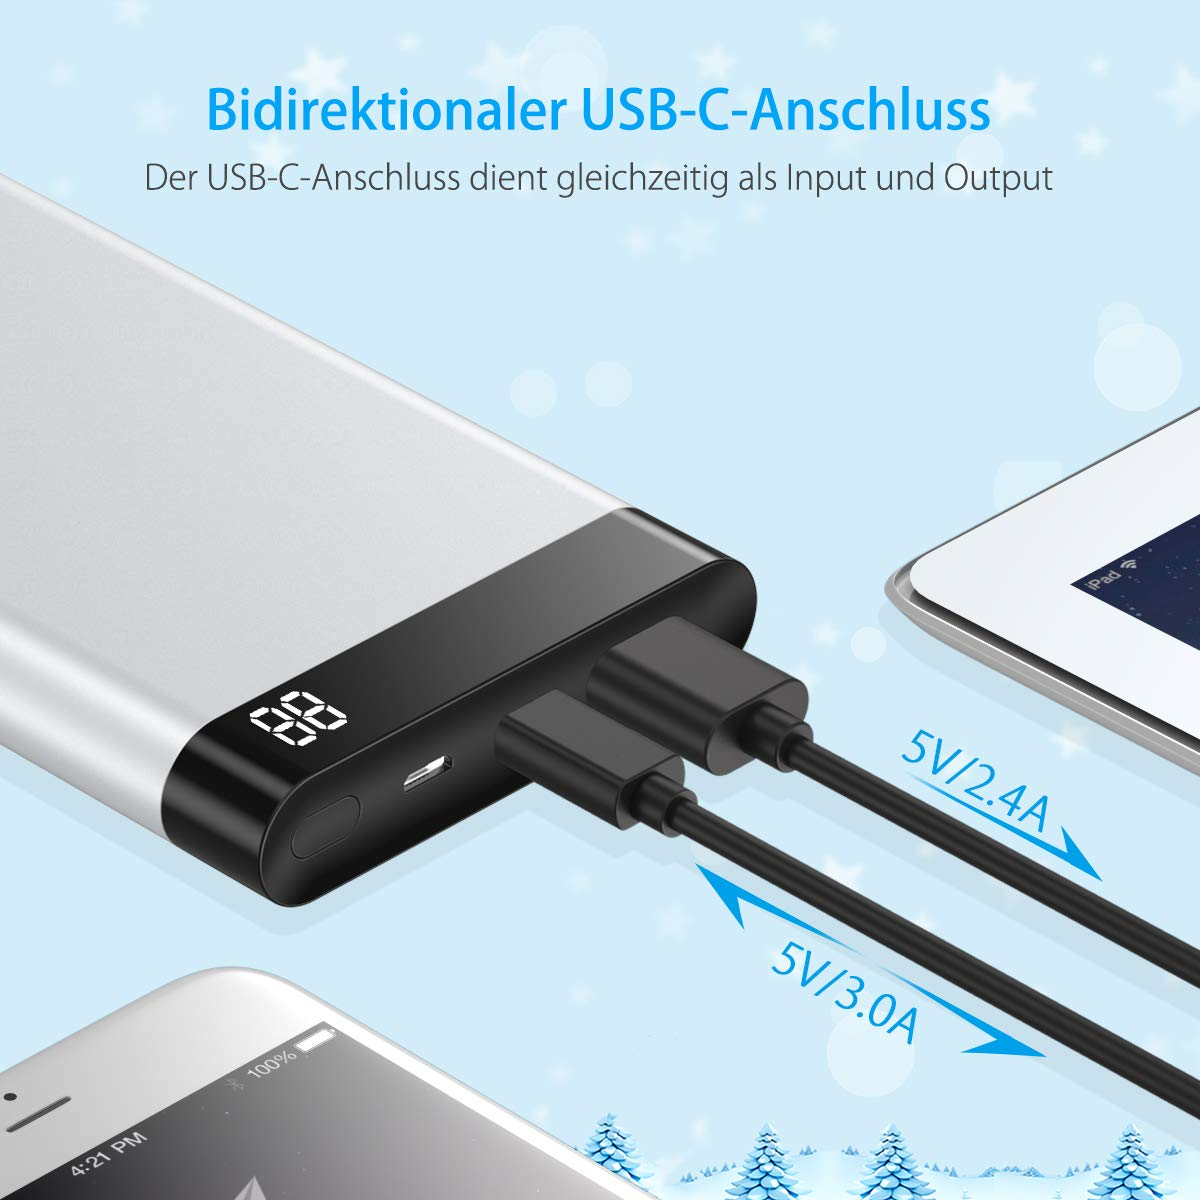 Poweradd VirgoⅠ10000 mAh Powerbank Metallische Handy Externe Akkus , LED Bildchirm Bildschirm zeigt die verbleibende Kapazität an, Besitzt Micro USB Input, USB Output, Ein Input/Output USB C Port